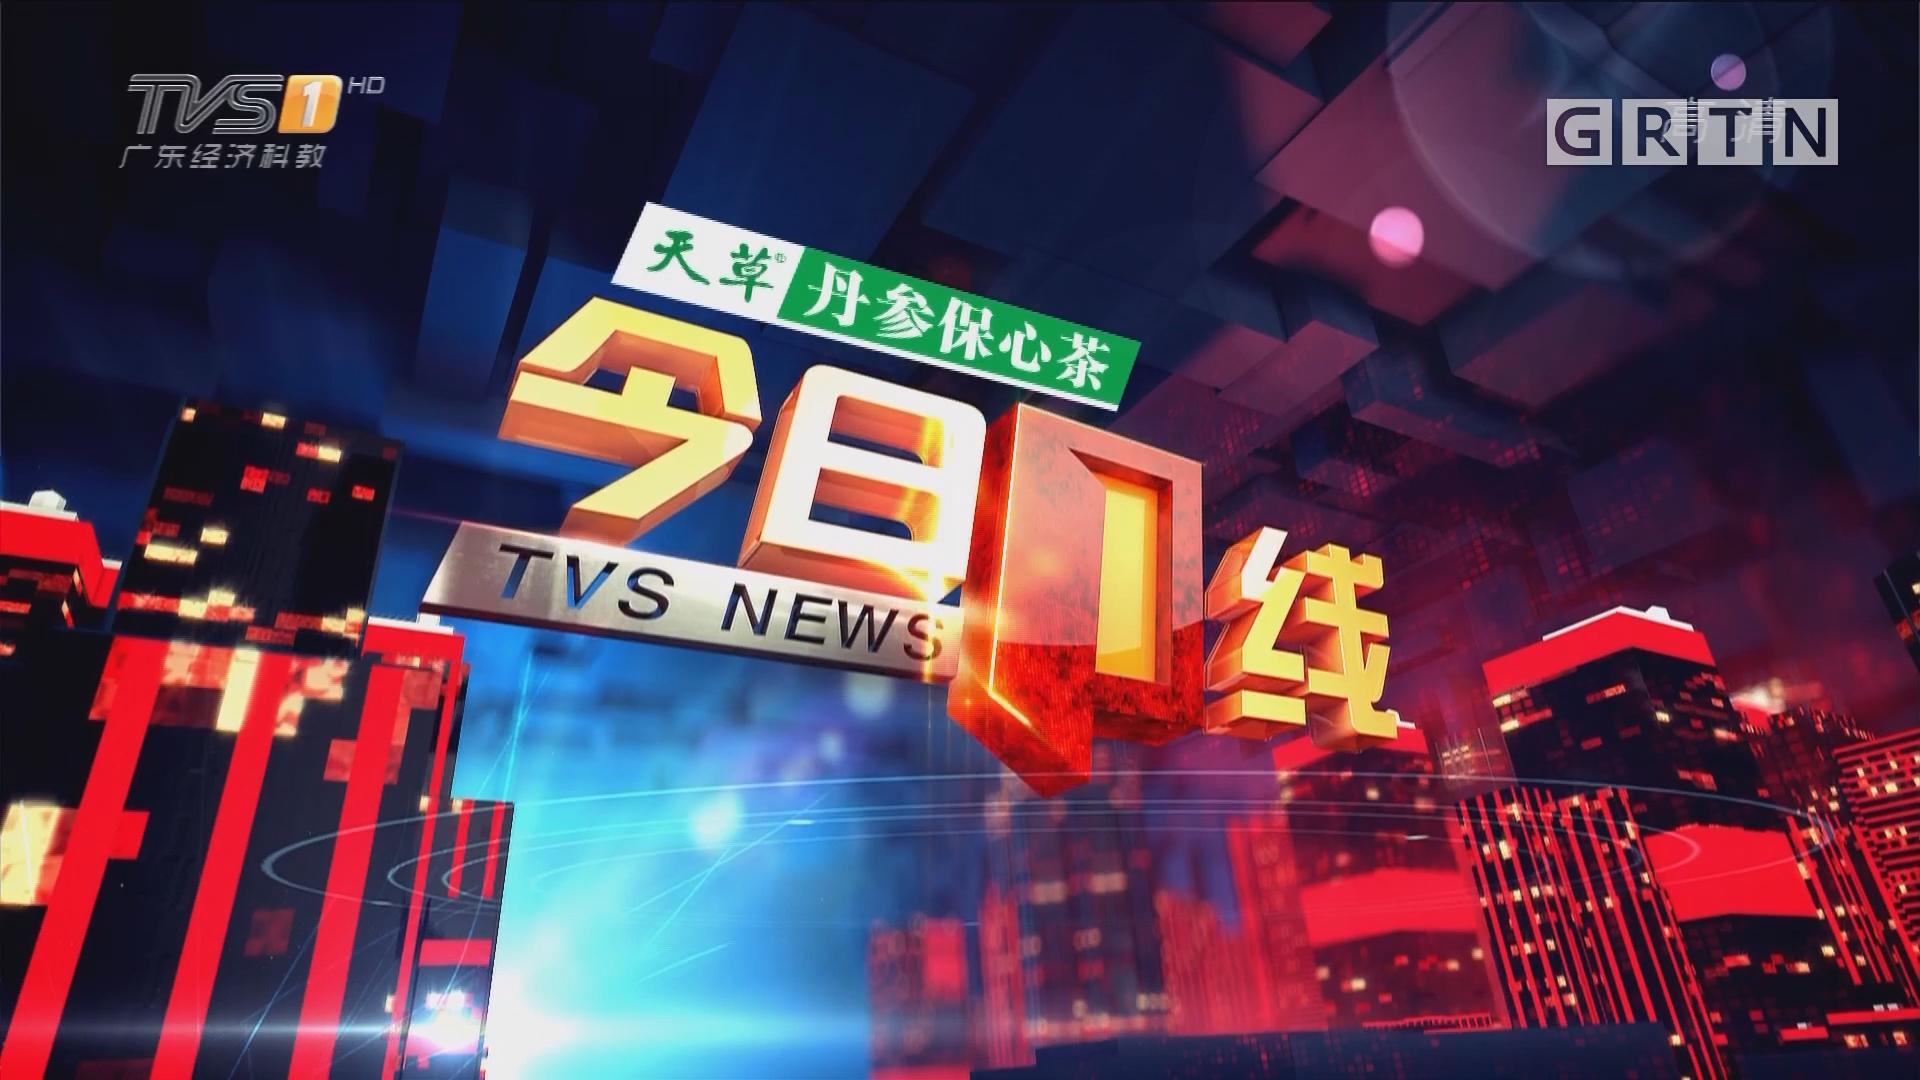 [HD][2018-02-01]今日一线:直击春运首日:广州 航拍高速 春运首日多路段行车缓慢